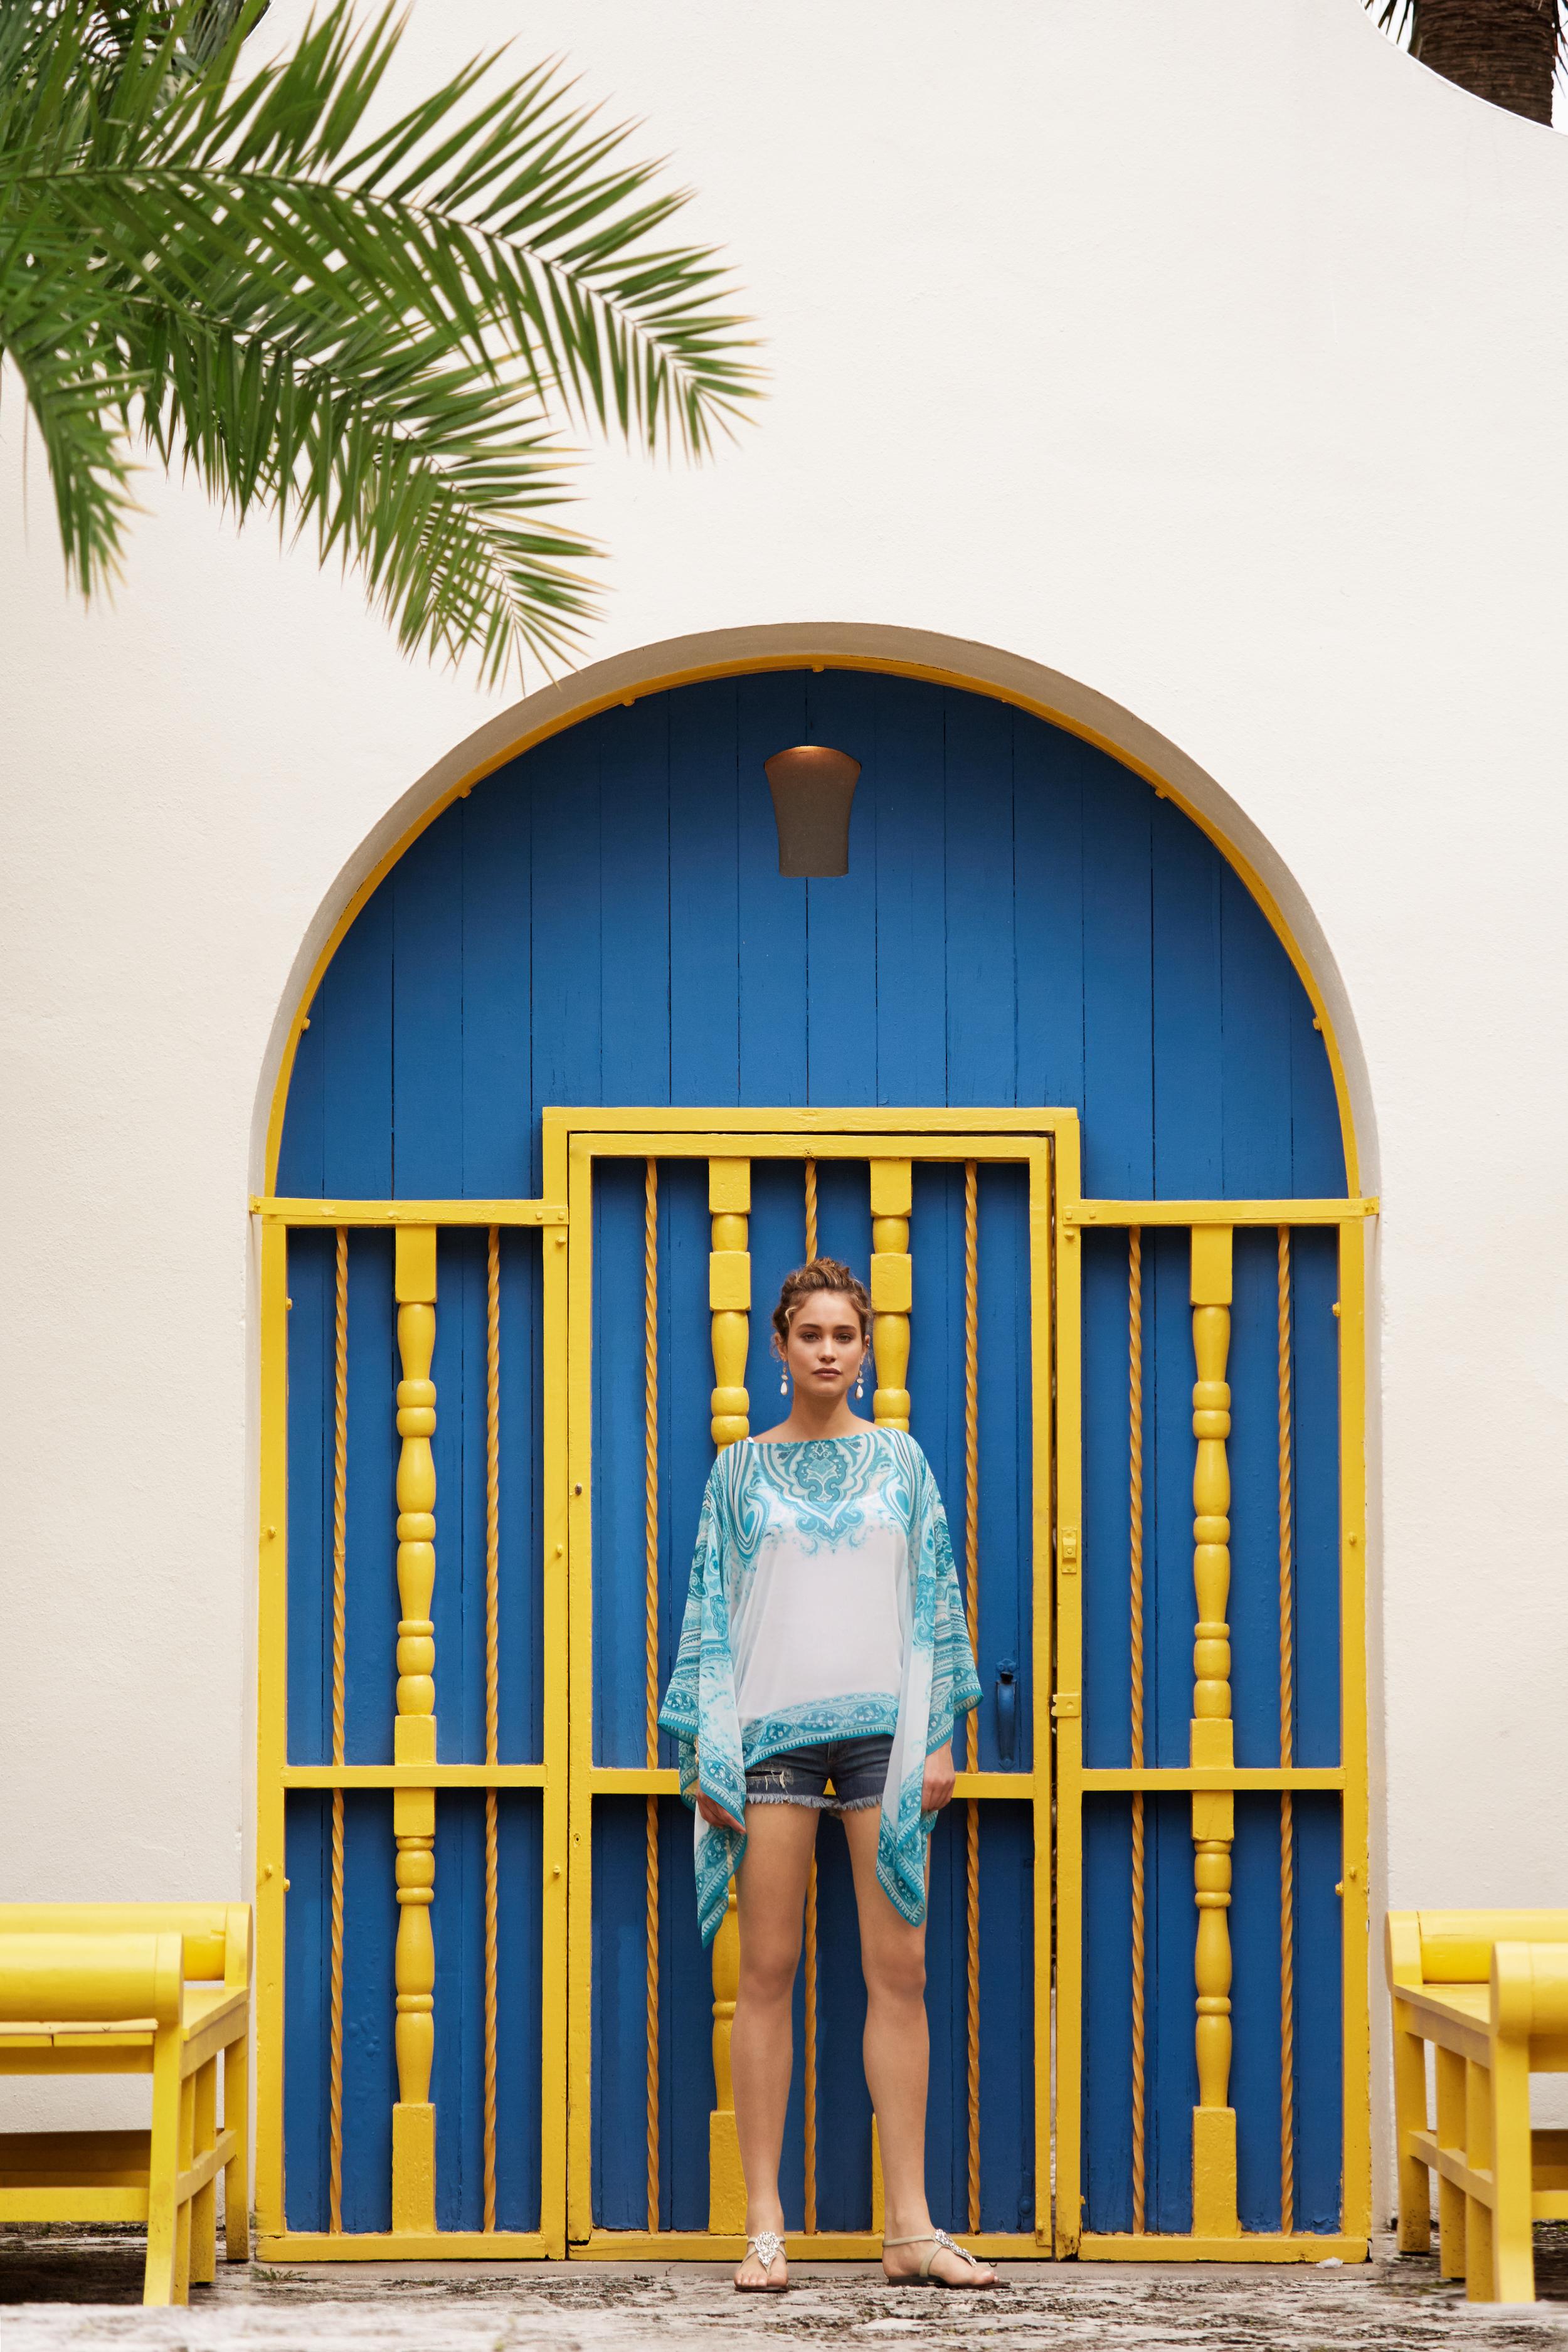 hannah davis photo shoot for calypso st barth and county fair productions miami 6